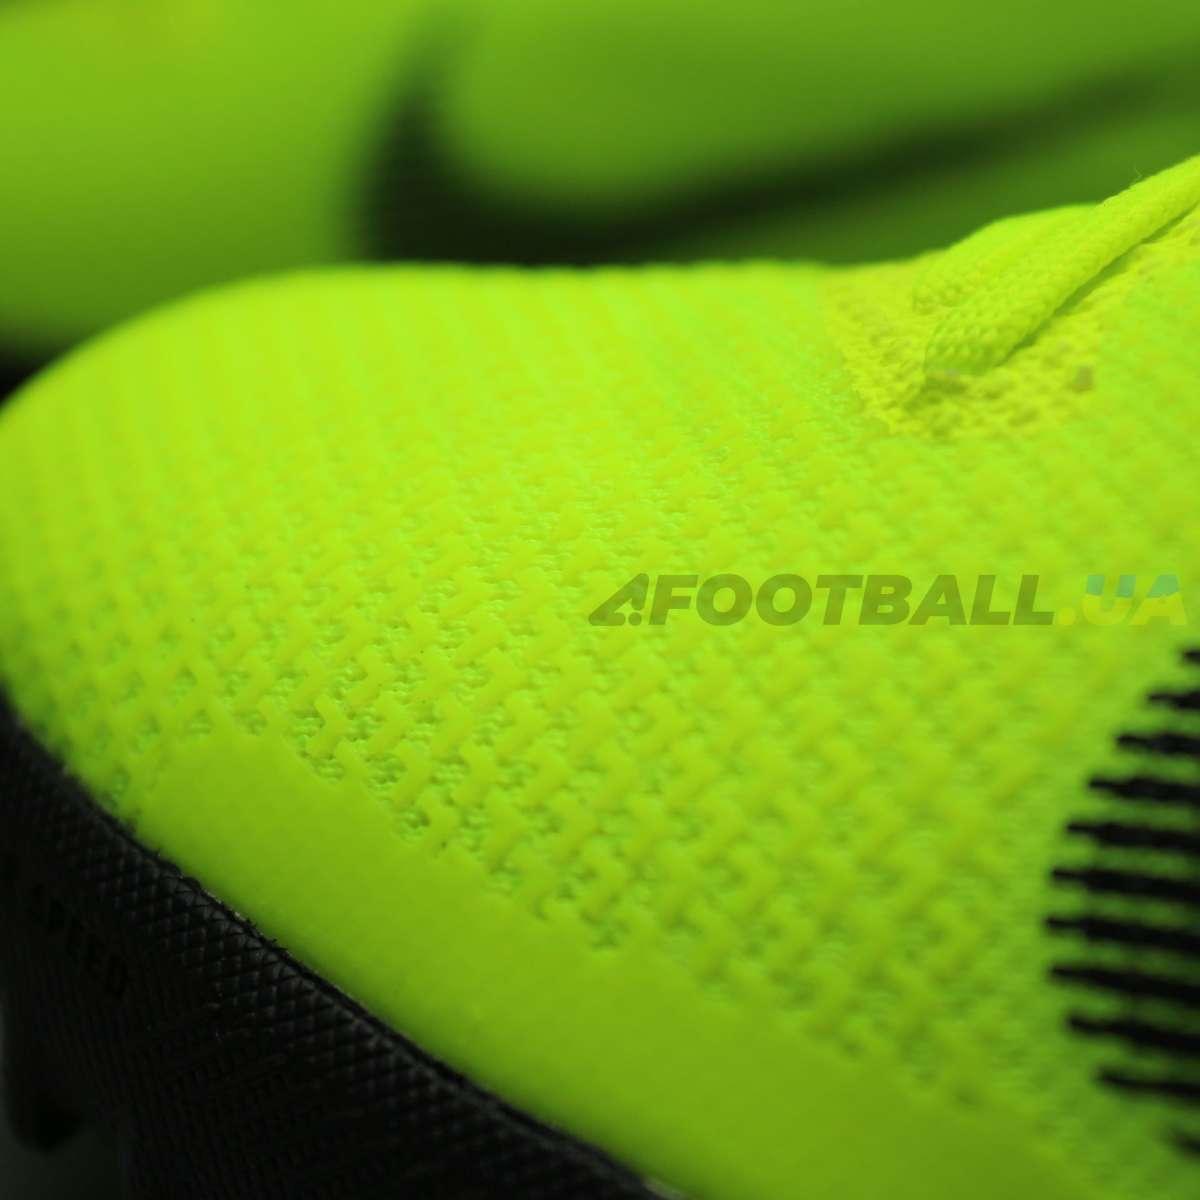 ... Сороконожки Nike Mercurial Vapor 12 Pro AH7388-701 2 ... 7d7f280c40927